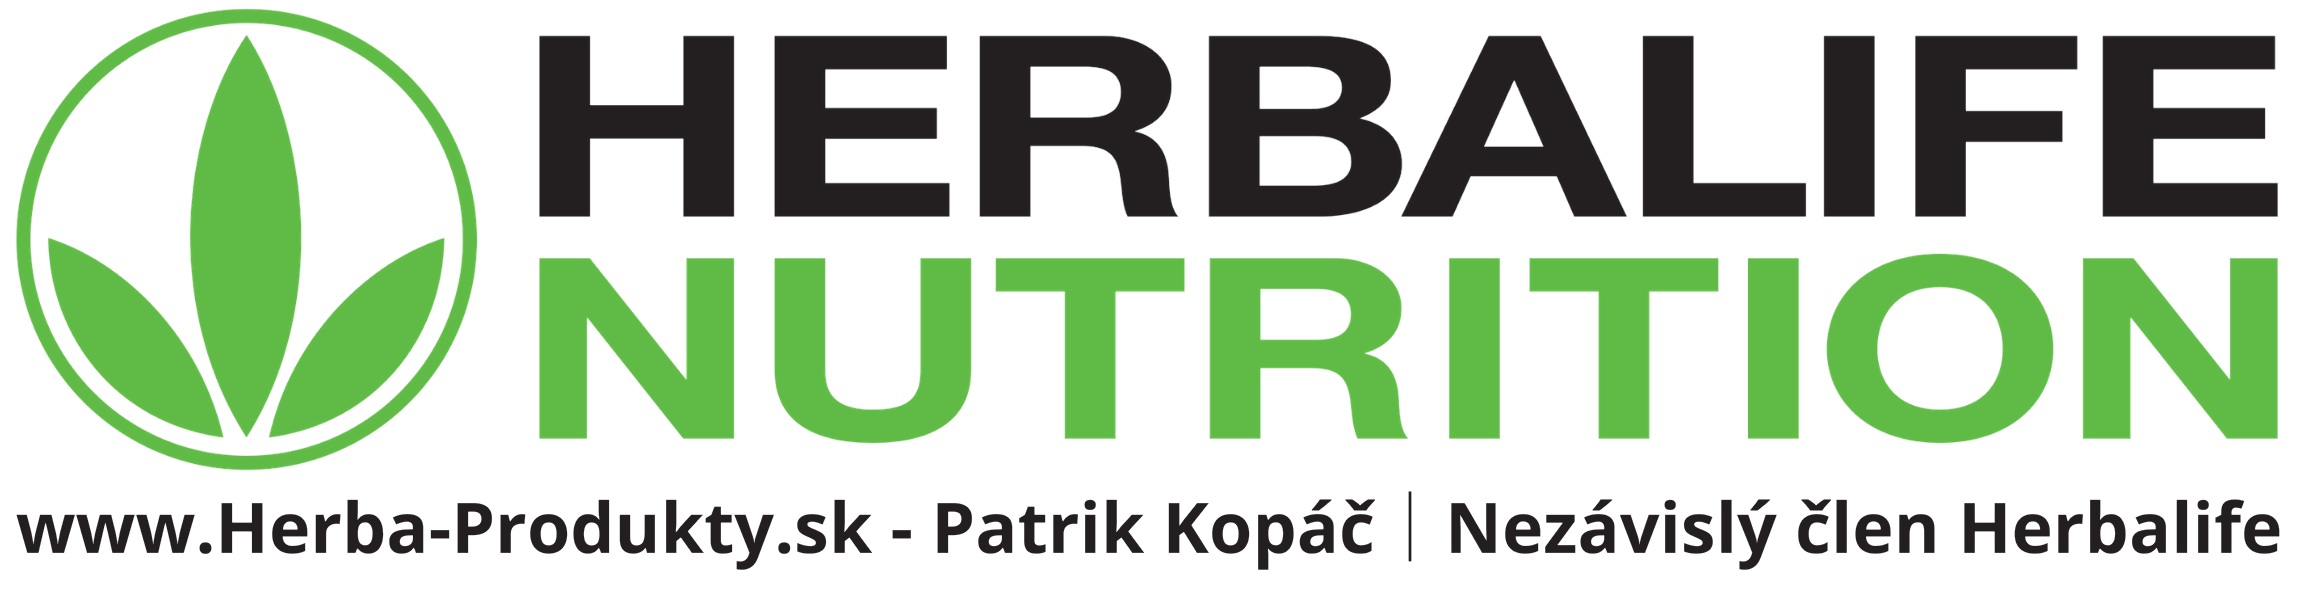 Herba-Produkty.sk